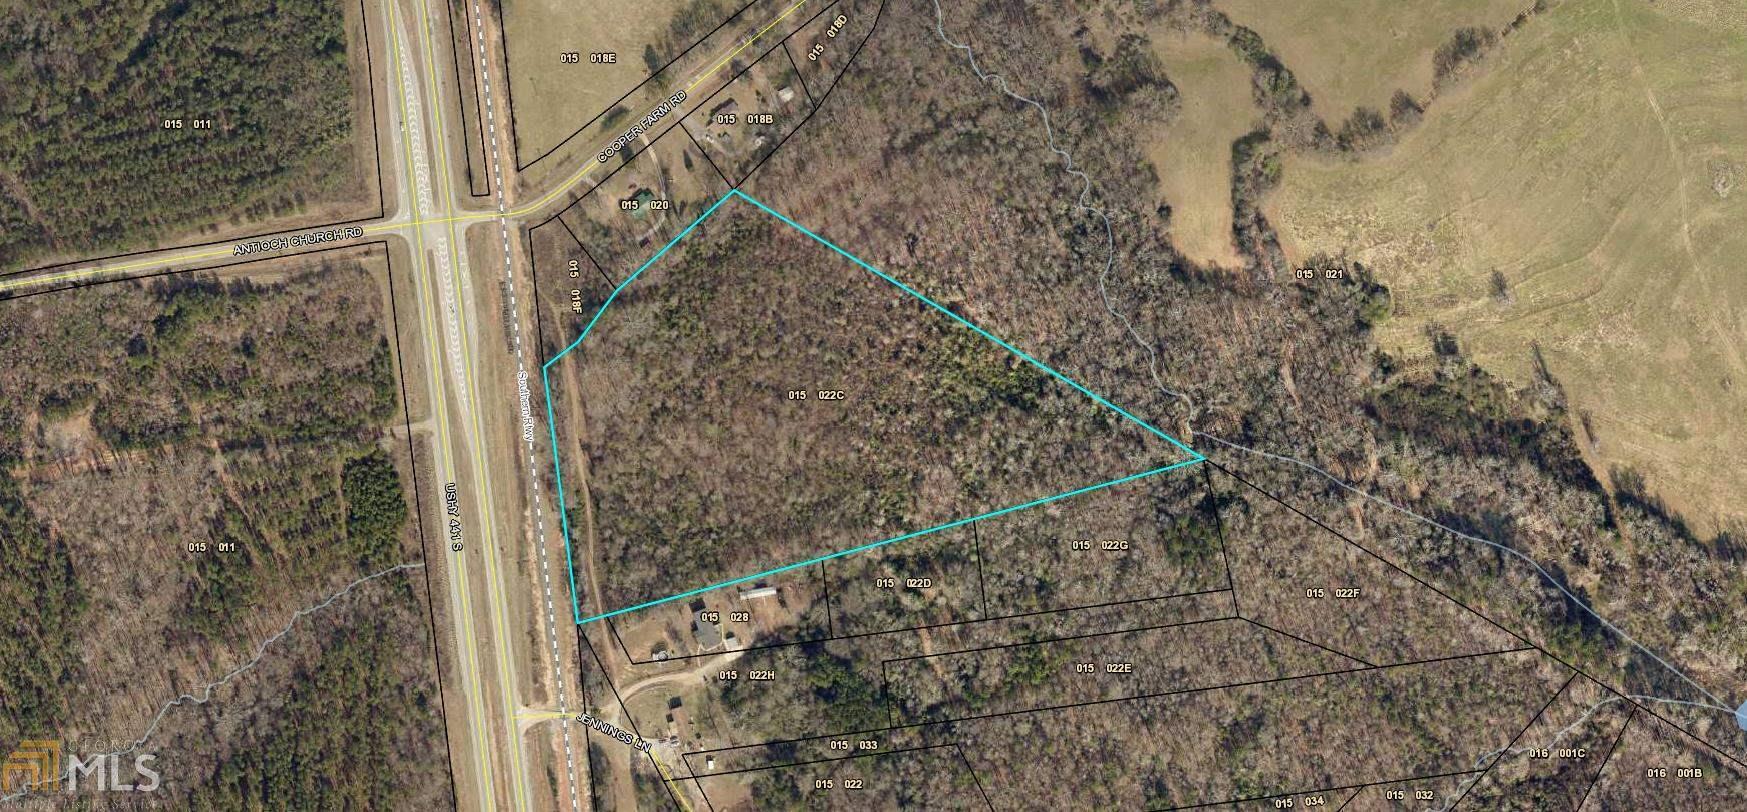 Keystone Communities 1 Us Hwy 441 S, Nicholson, GA, 30565 1 ...